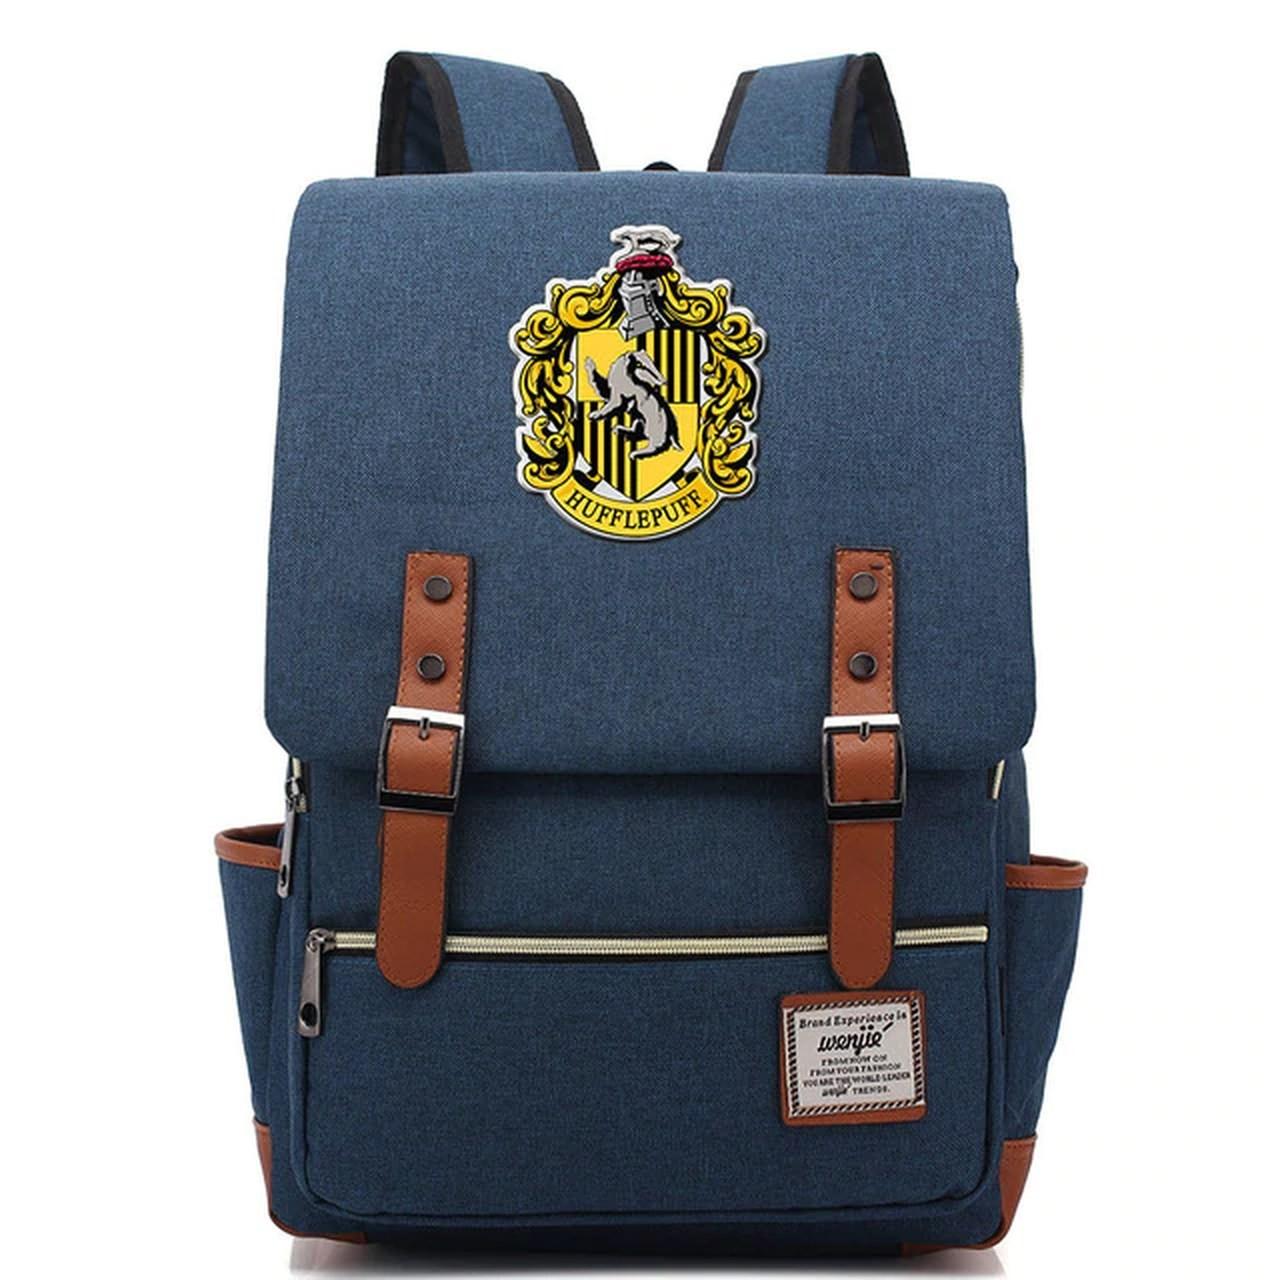 Mochila Hogwarts Casa Lufa-Lufa: Harry Potter (azul) - EV